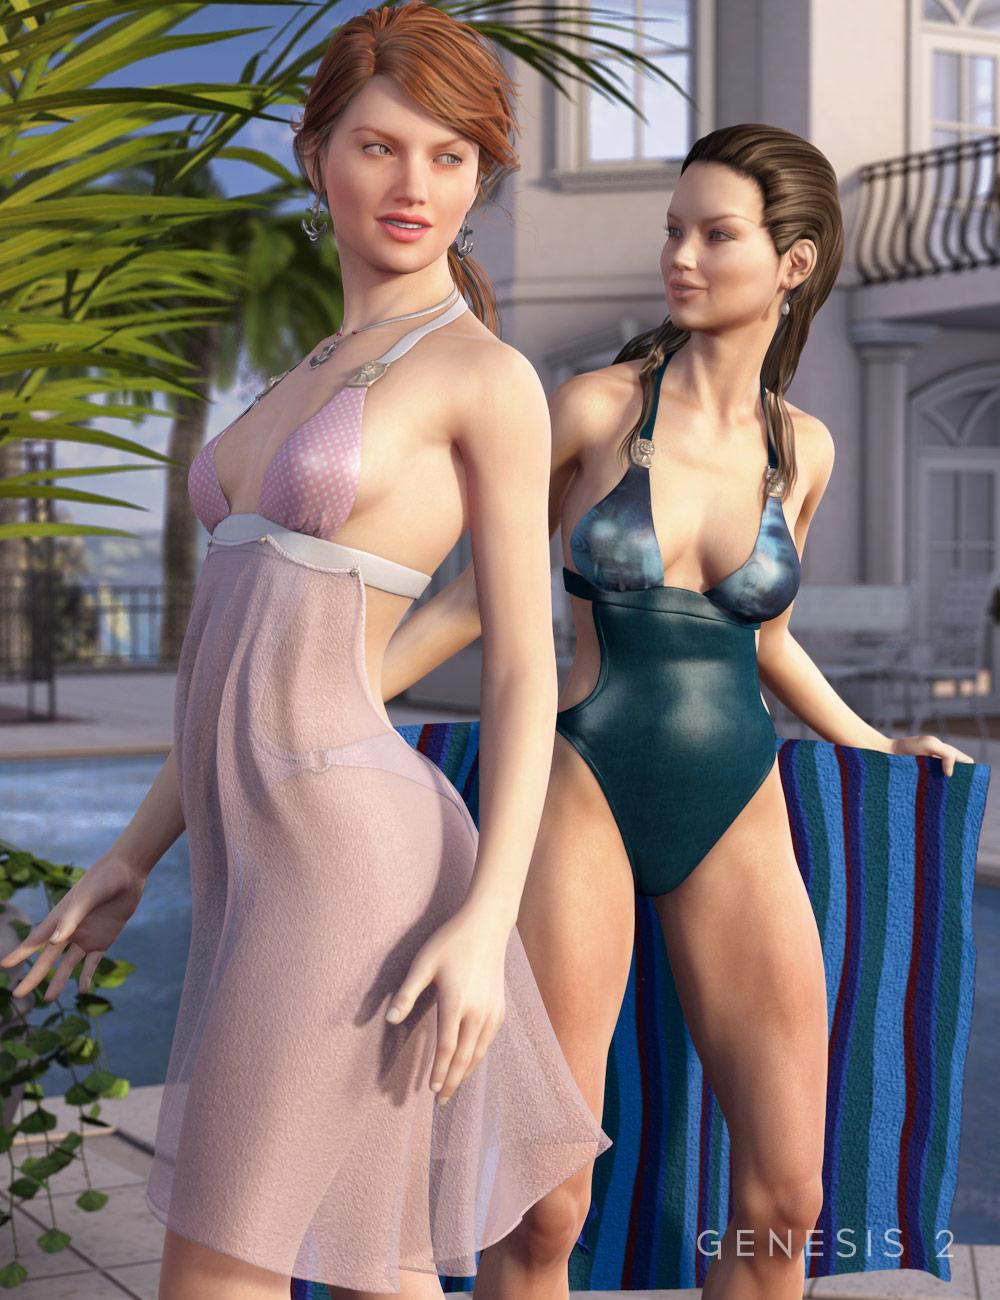 Ahoy V6 Textures by: Sarsa, 3D Models by Daz 3D